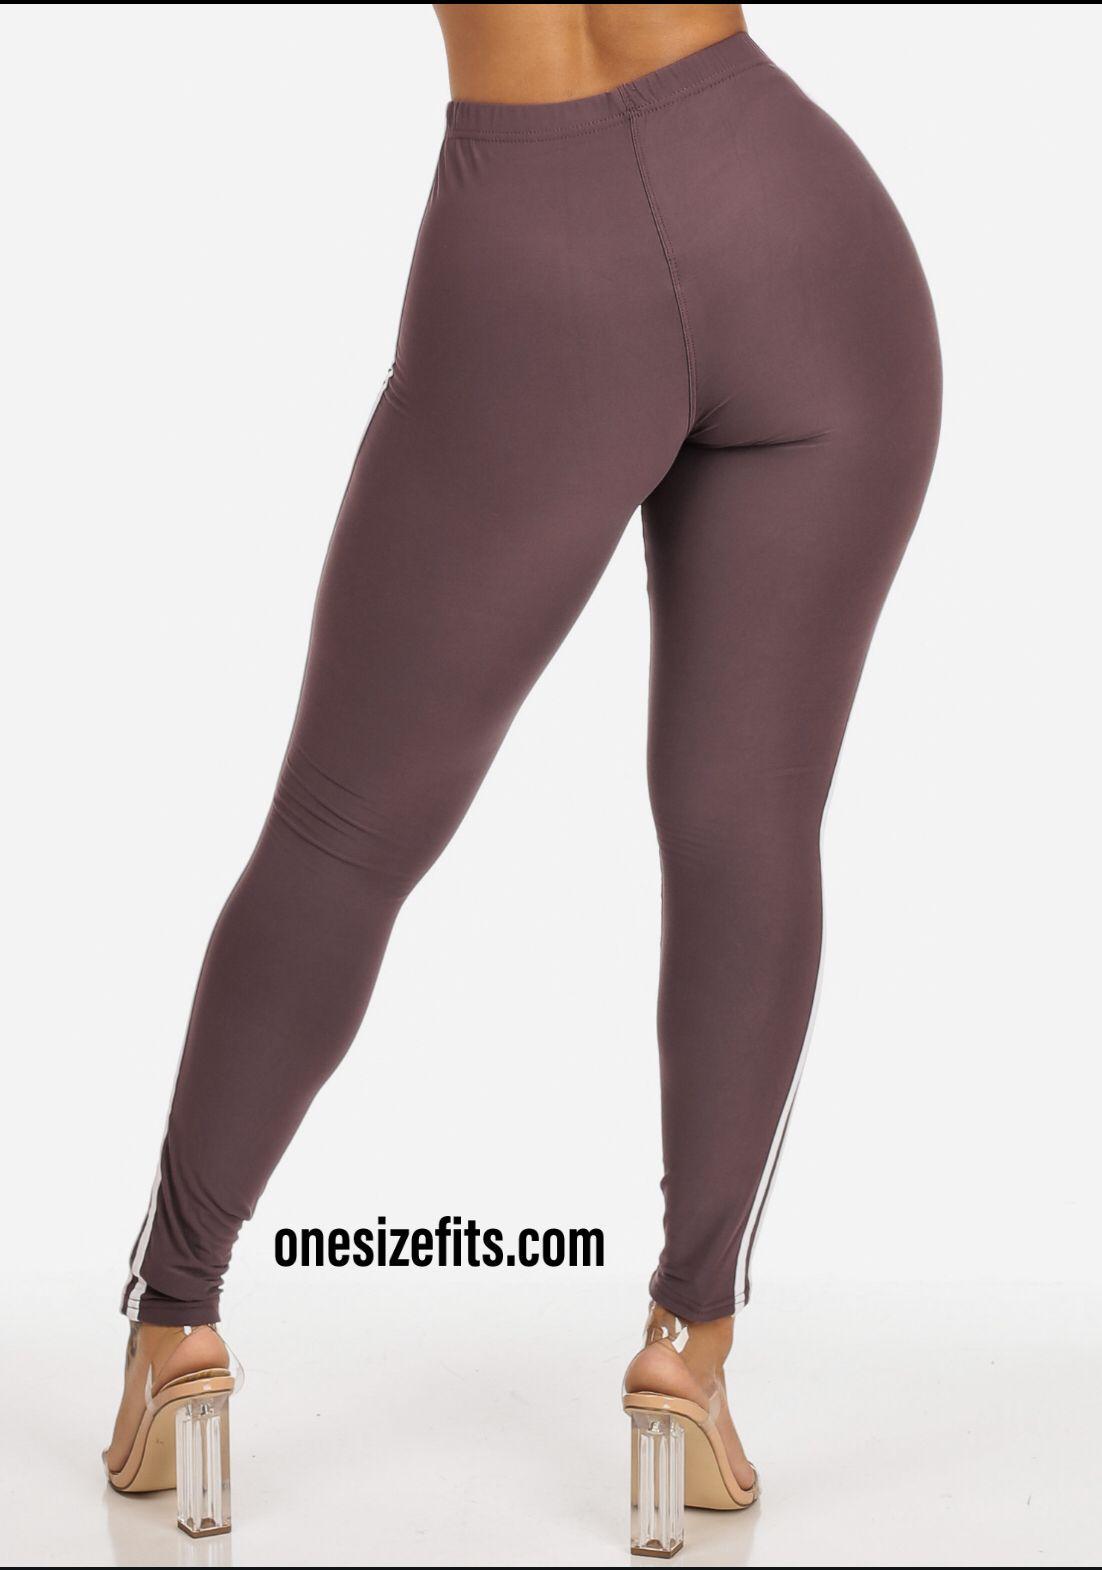 b2f78140b2 Raisin Color Women,s Skinny Fit Waistline Leggings Pants SOLO1R ...